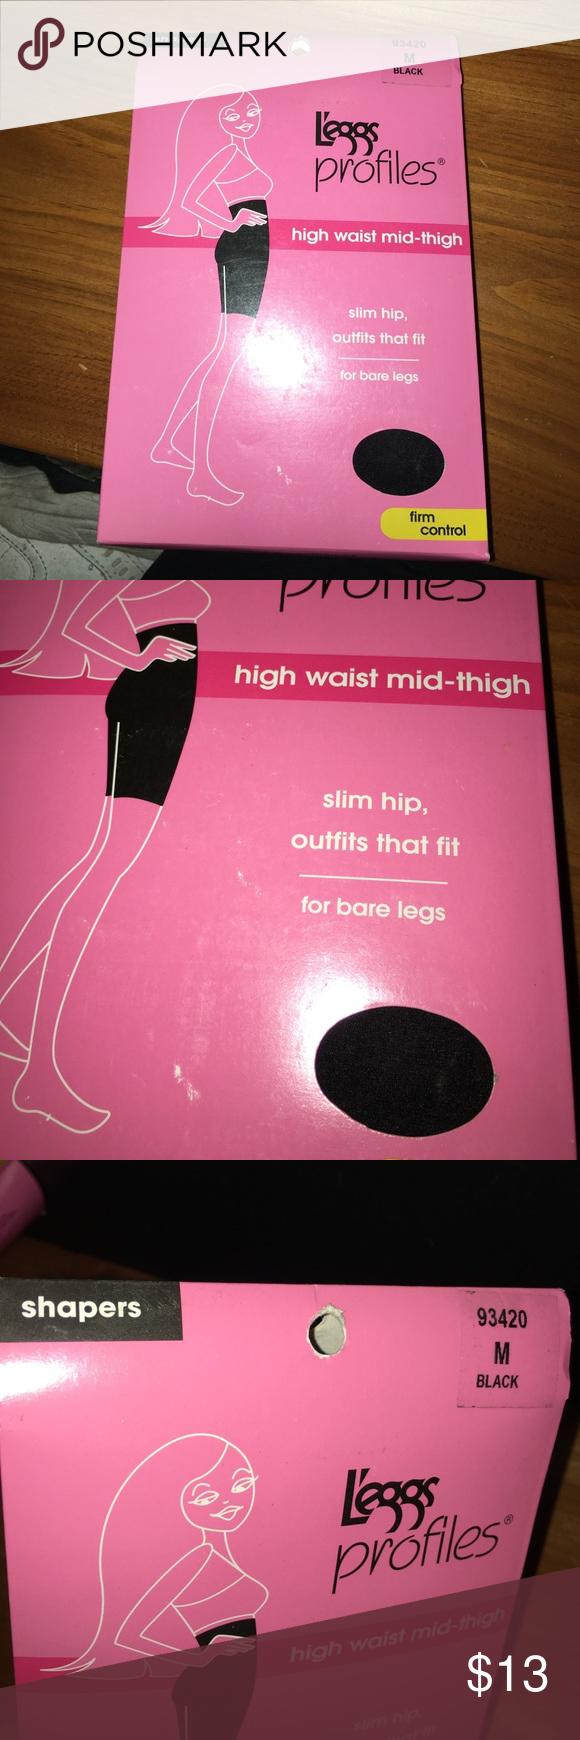 d463549678 Leggs Profiles High Waist Mid Thigh Shaper Medium New in package. Black.  Medium. Leggs Intimates   Sleepwear Shapewear